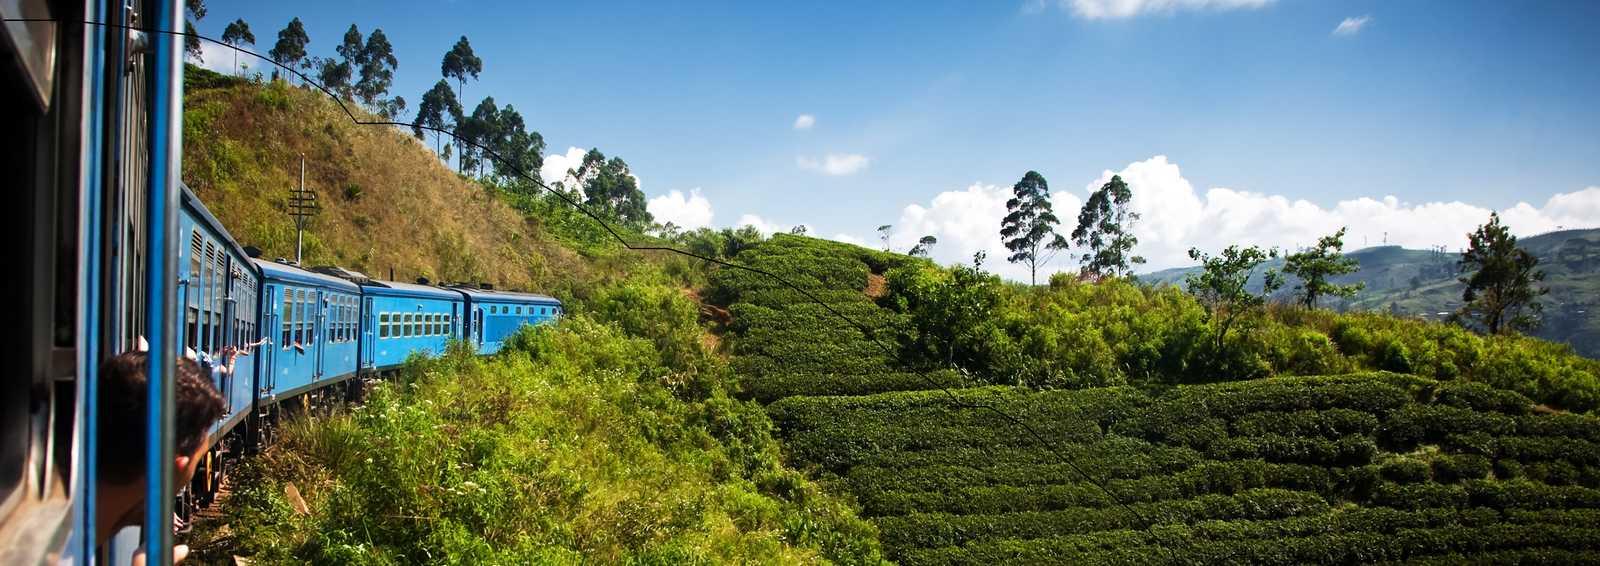 Train to Bandarawela, Sri Lanka